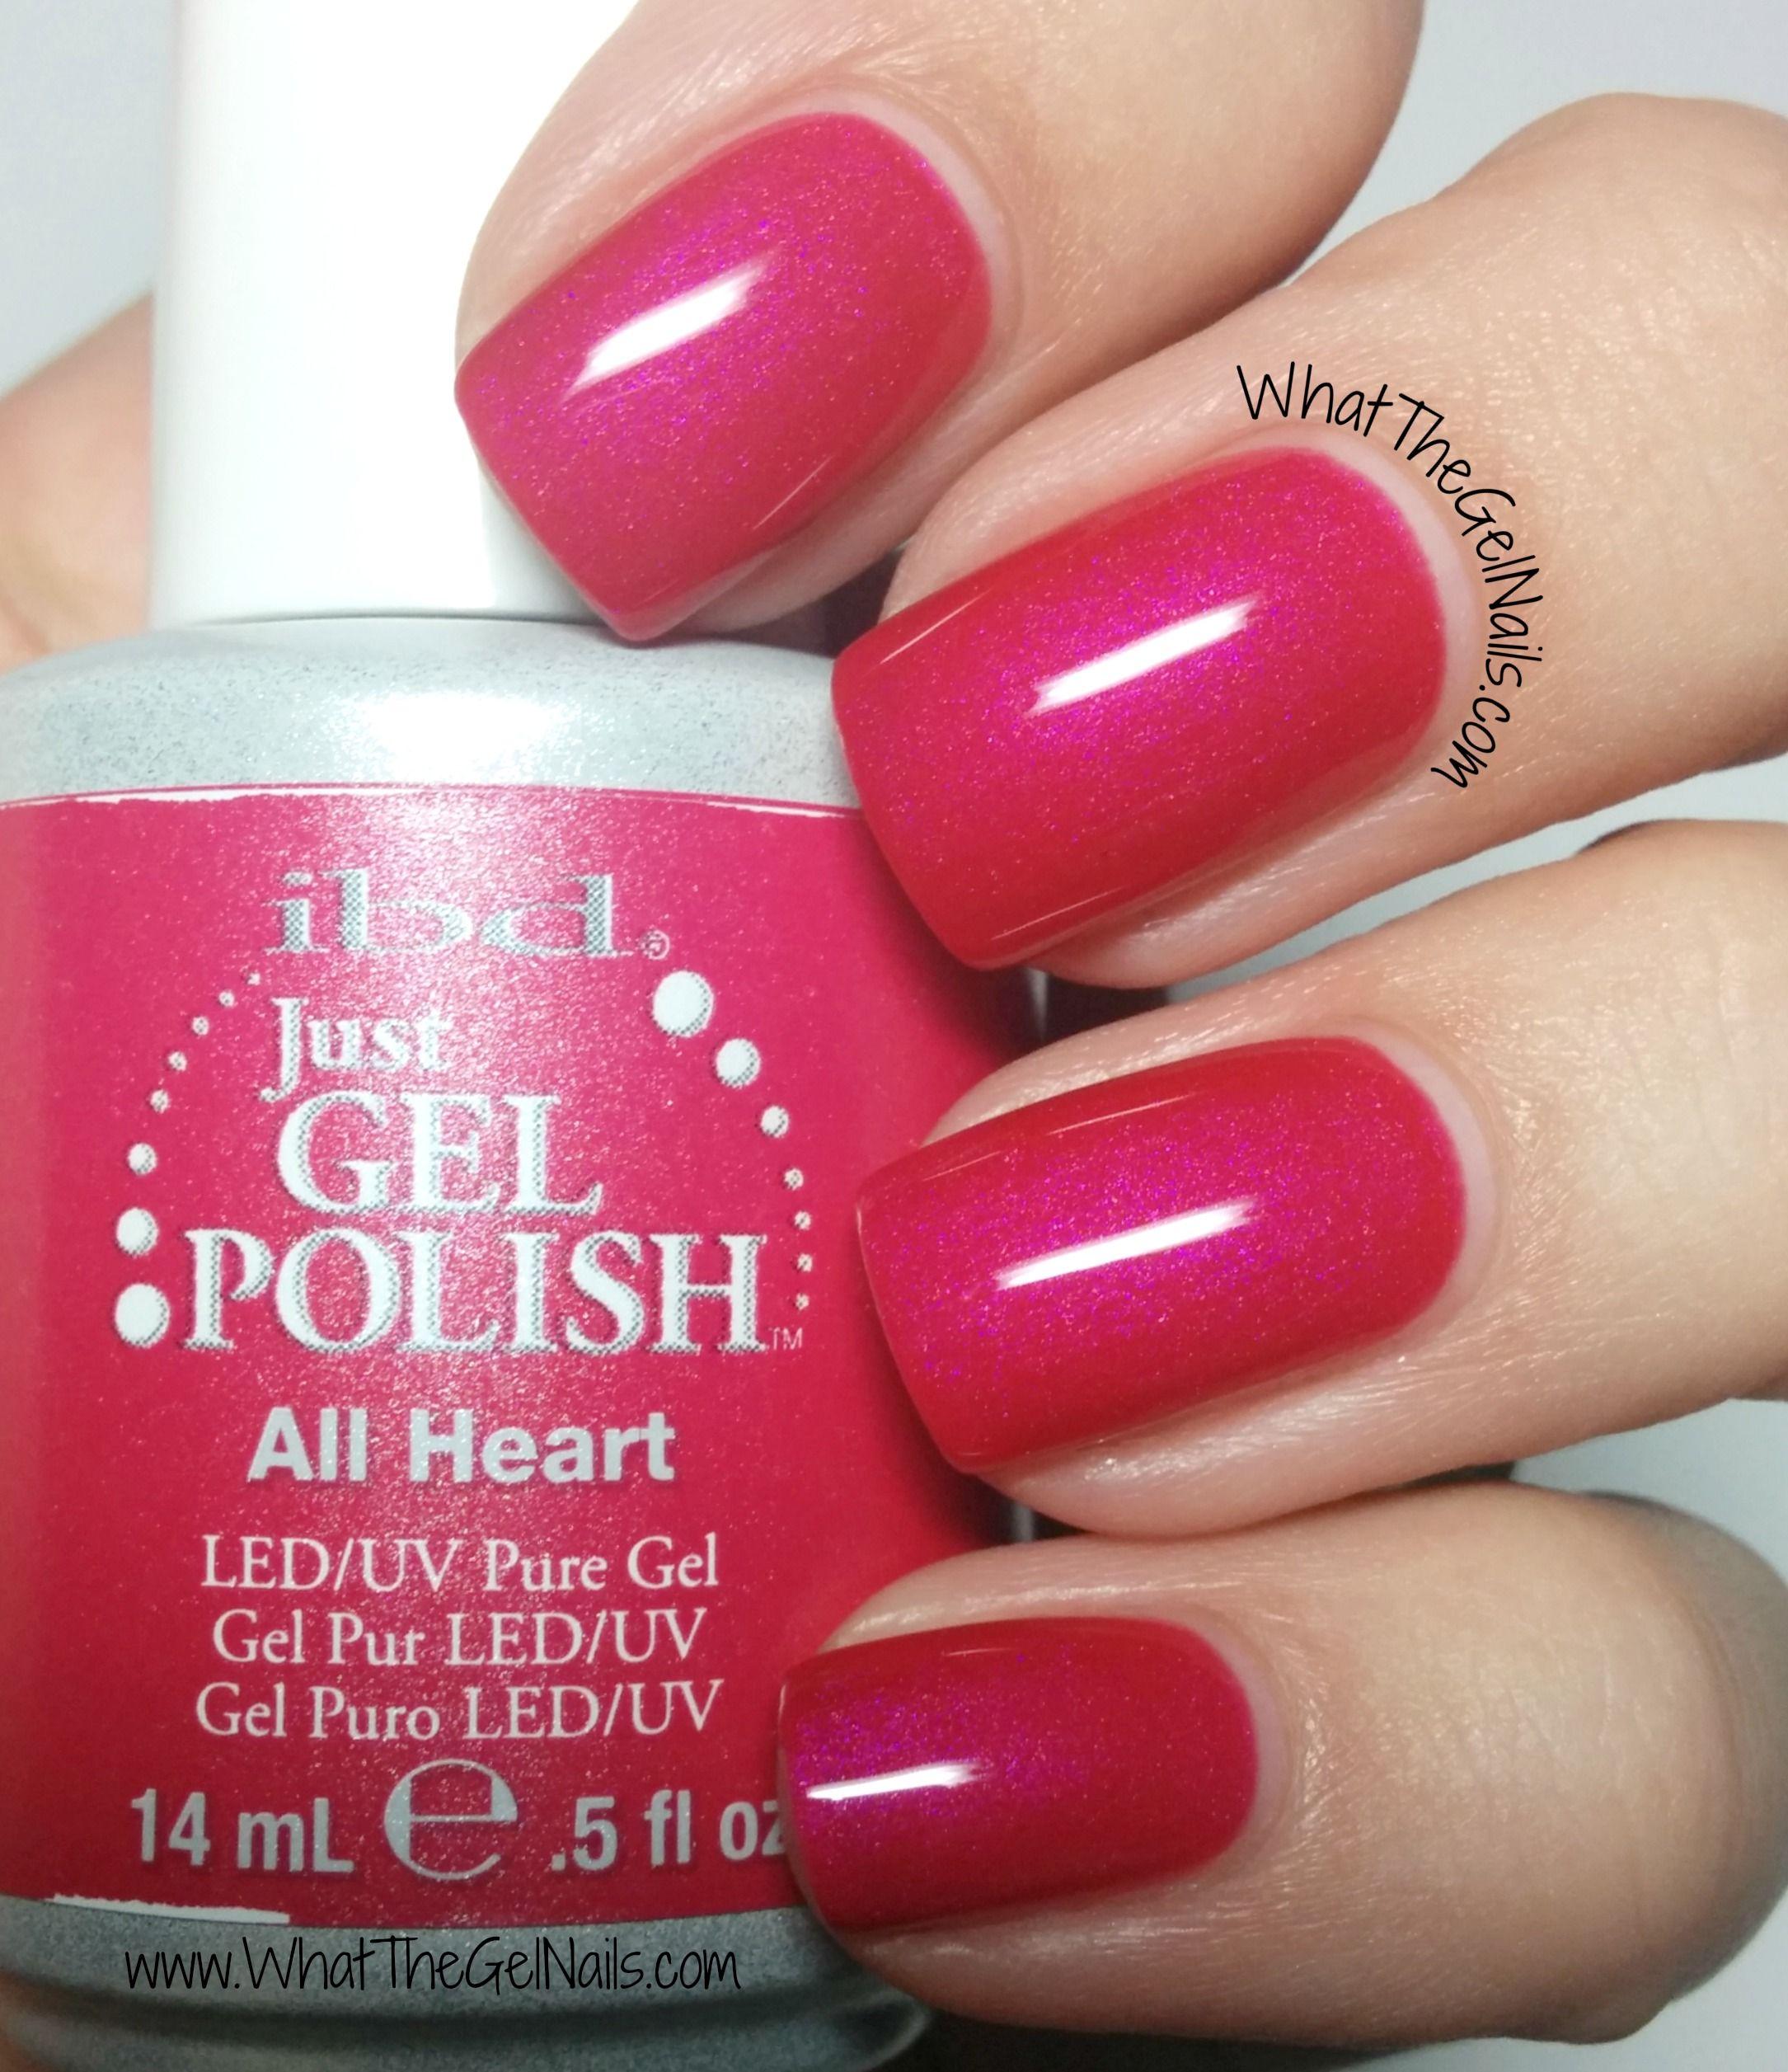 Gel Nail Polishes: IBD All Heart Plus More Pink IBD Gel Nail Polish Colors